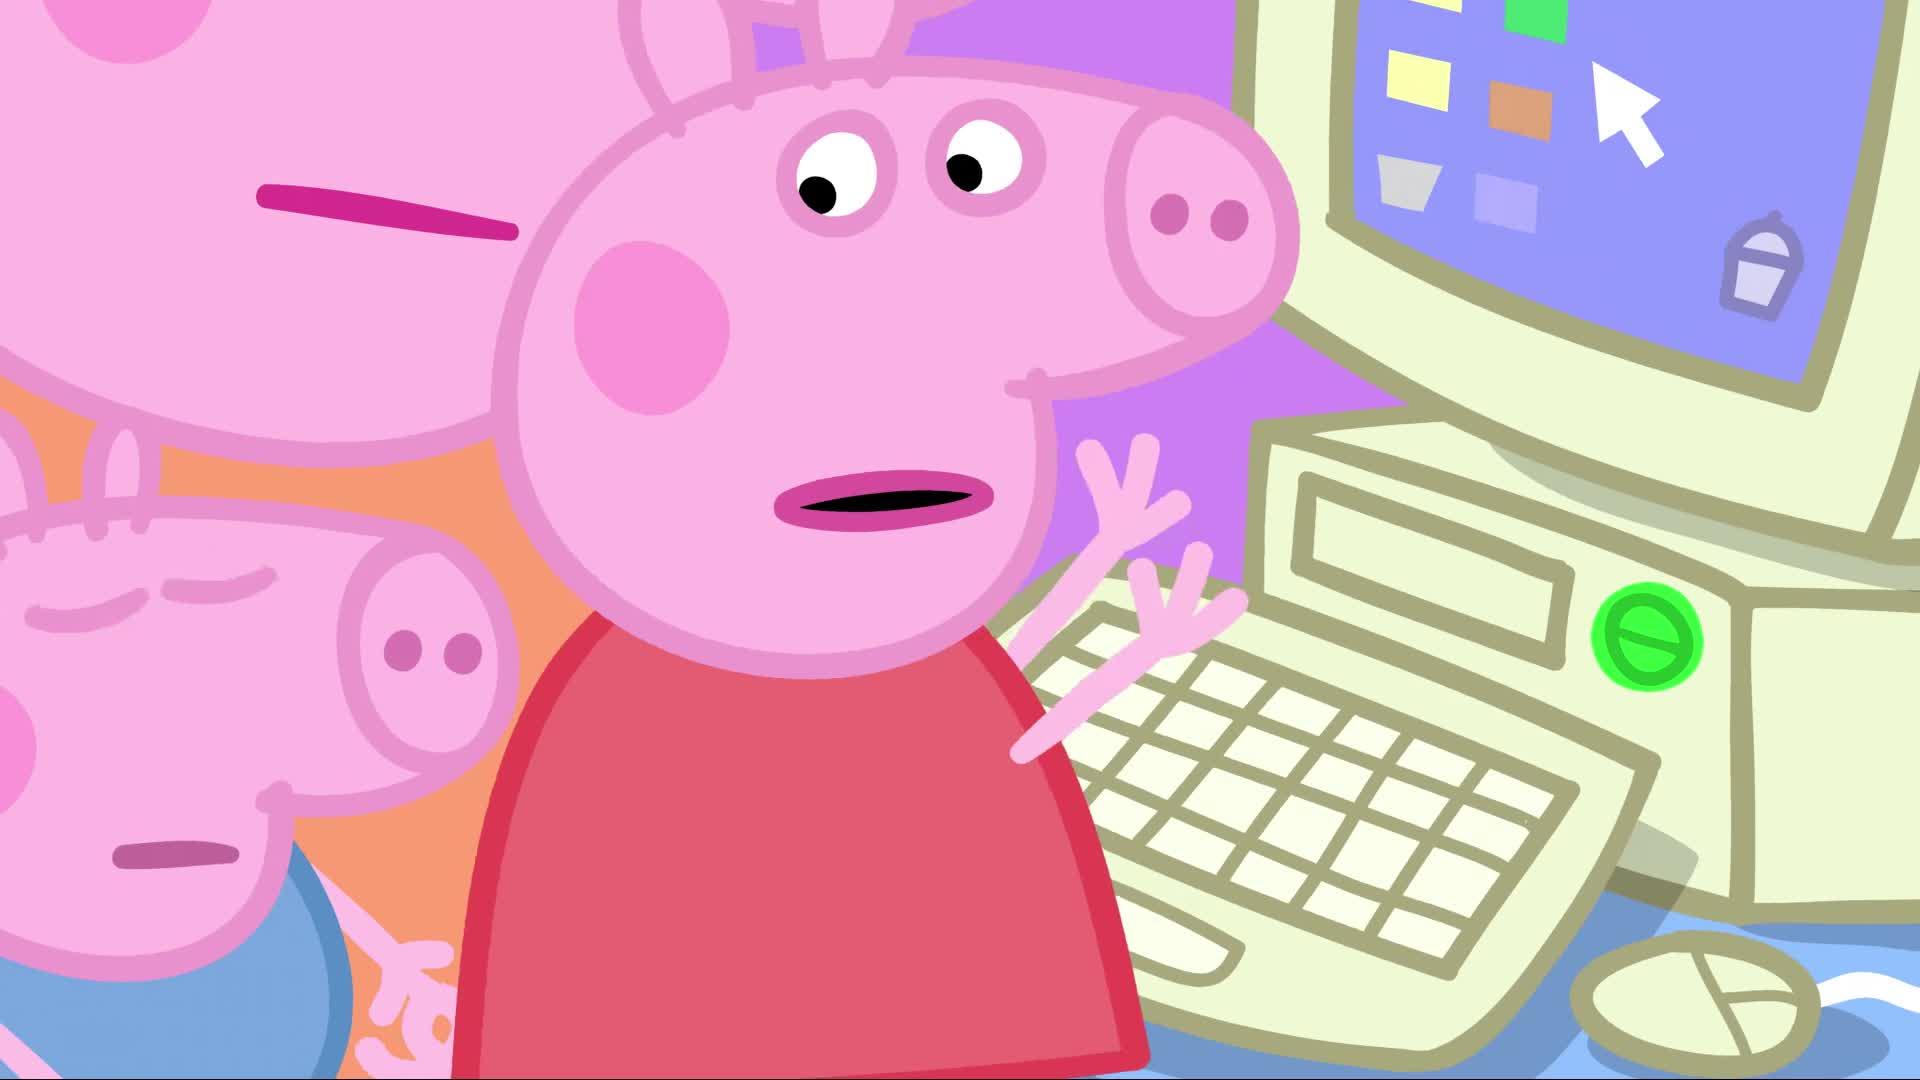 Peppa Pig Et Les Bsod Gif Gfycat